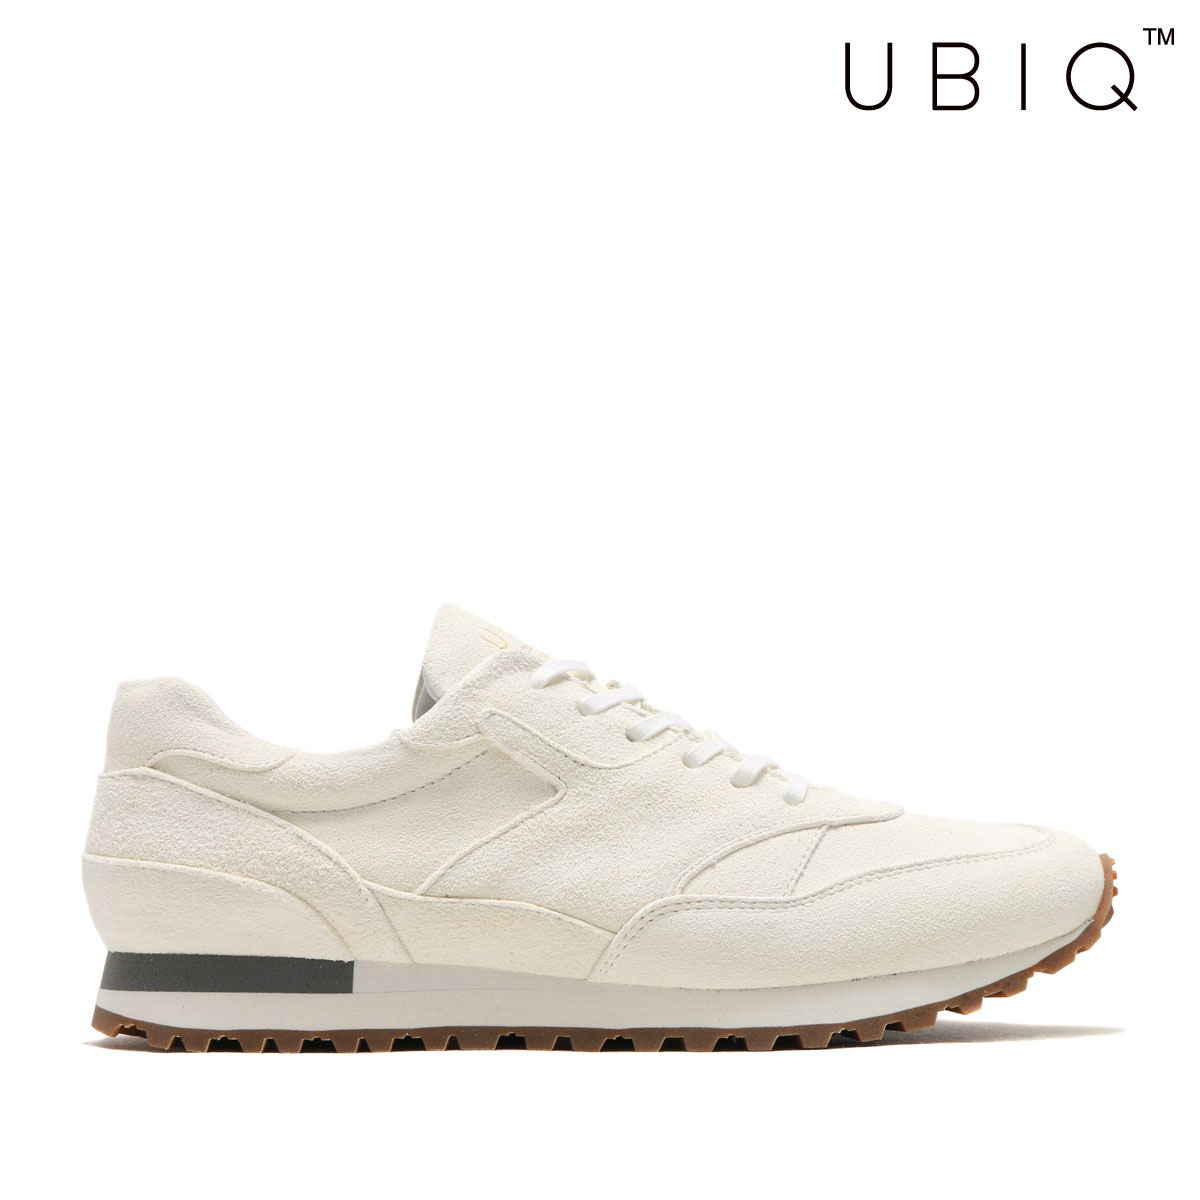 UBIQ SEED J(ユービック シード ジェイ)(WHITE)【メンズ】【スニーカー】【日本製】【17SU-I】